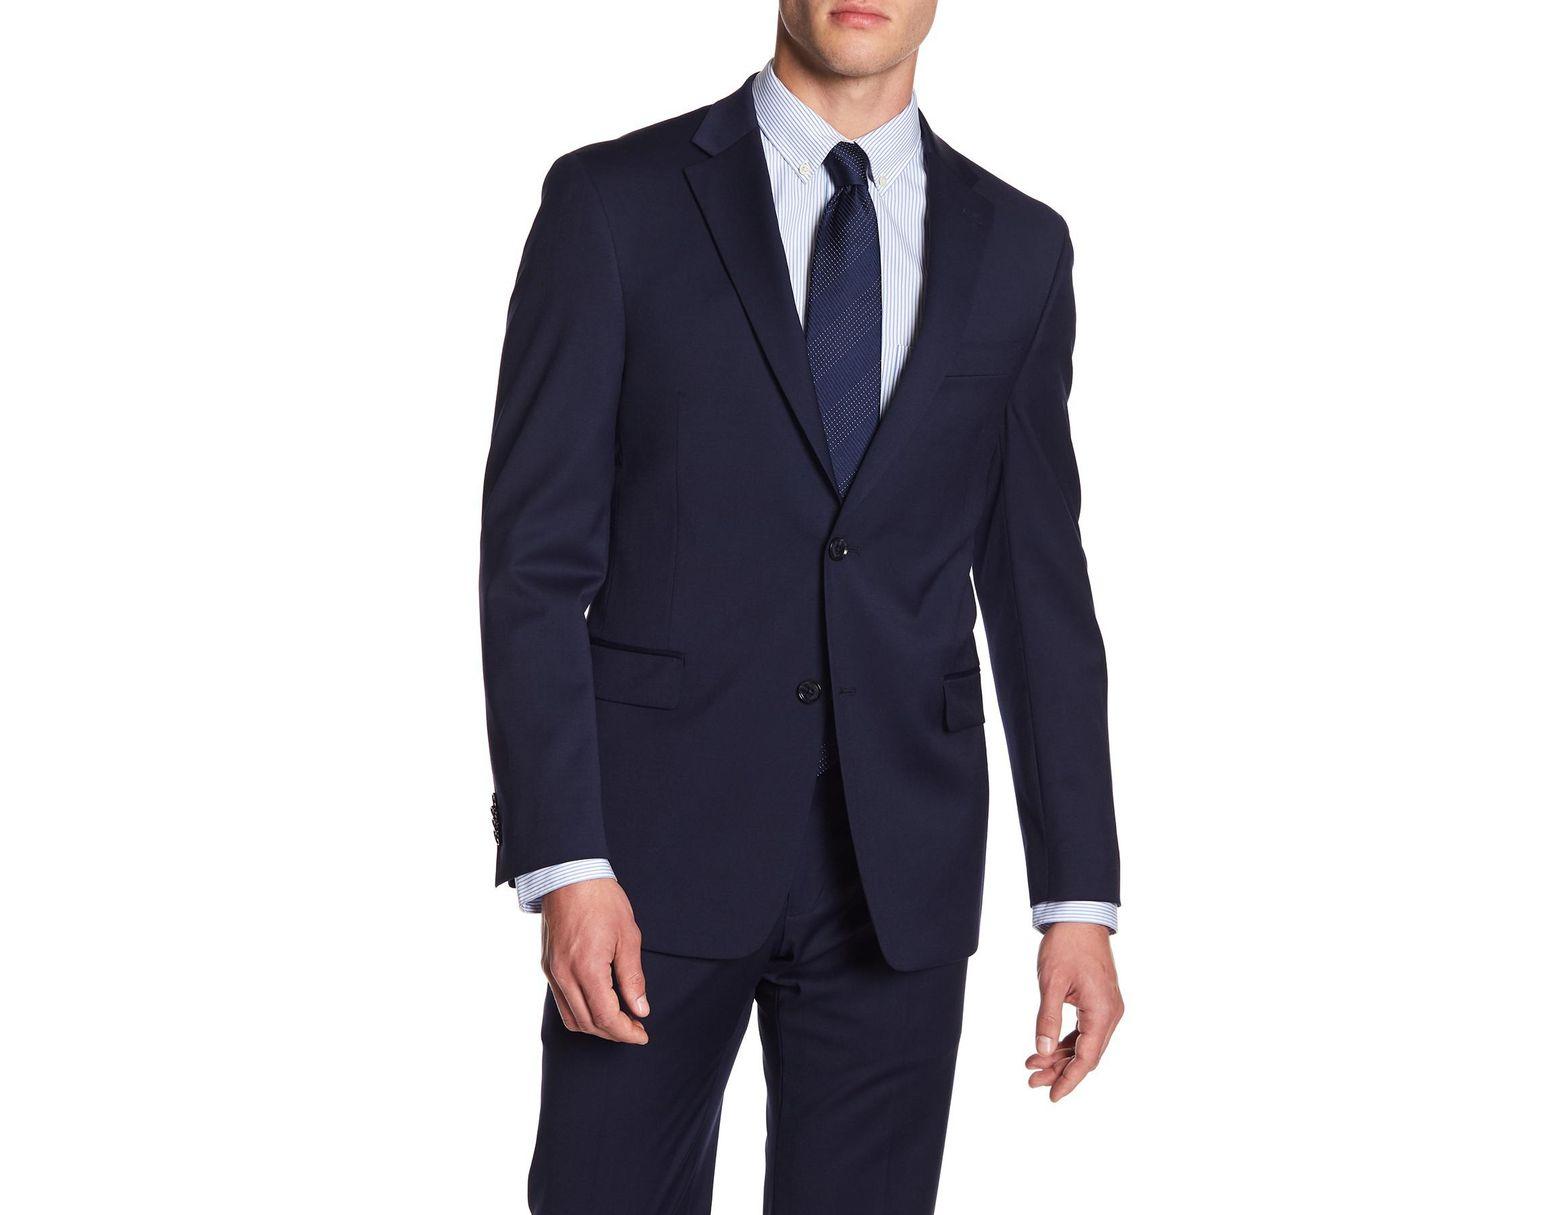 dcb5986f6d5 Tommy Hilfiger Adams Modern Fit Th Flex Performance Wool Blend Suit  Separates Jacket in Blue for Men - Lyst